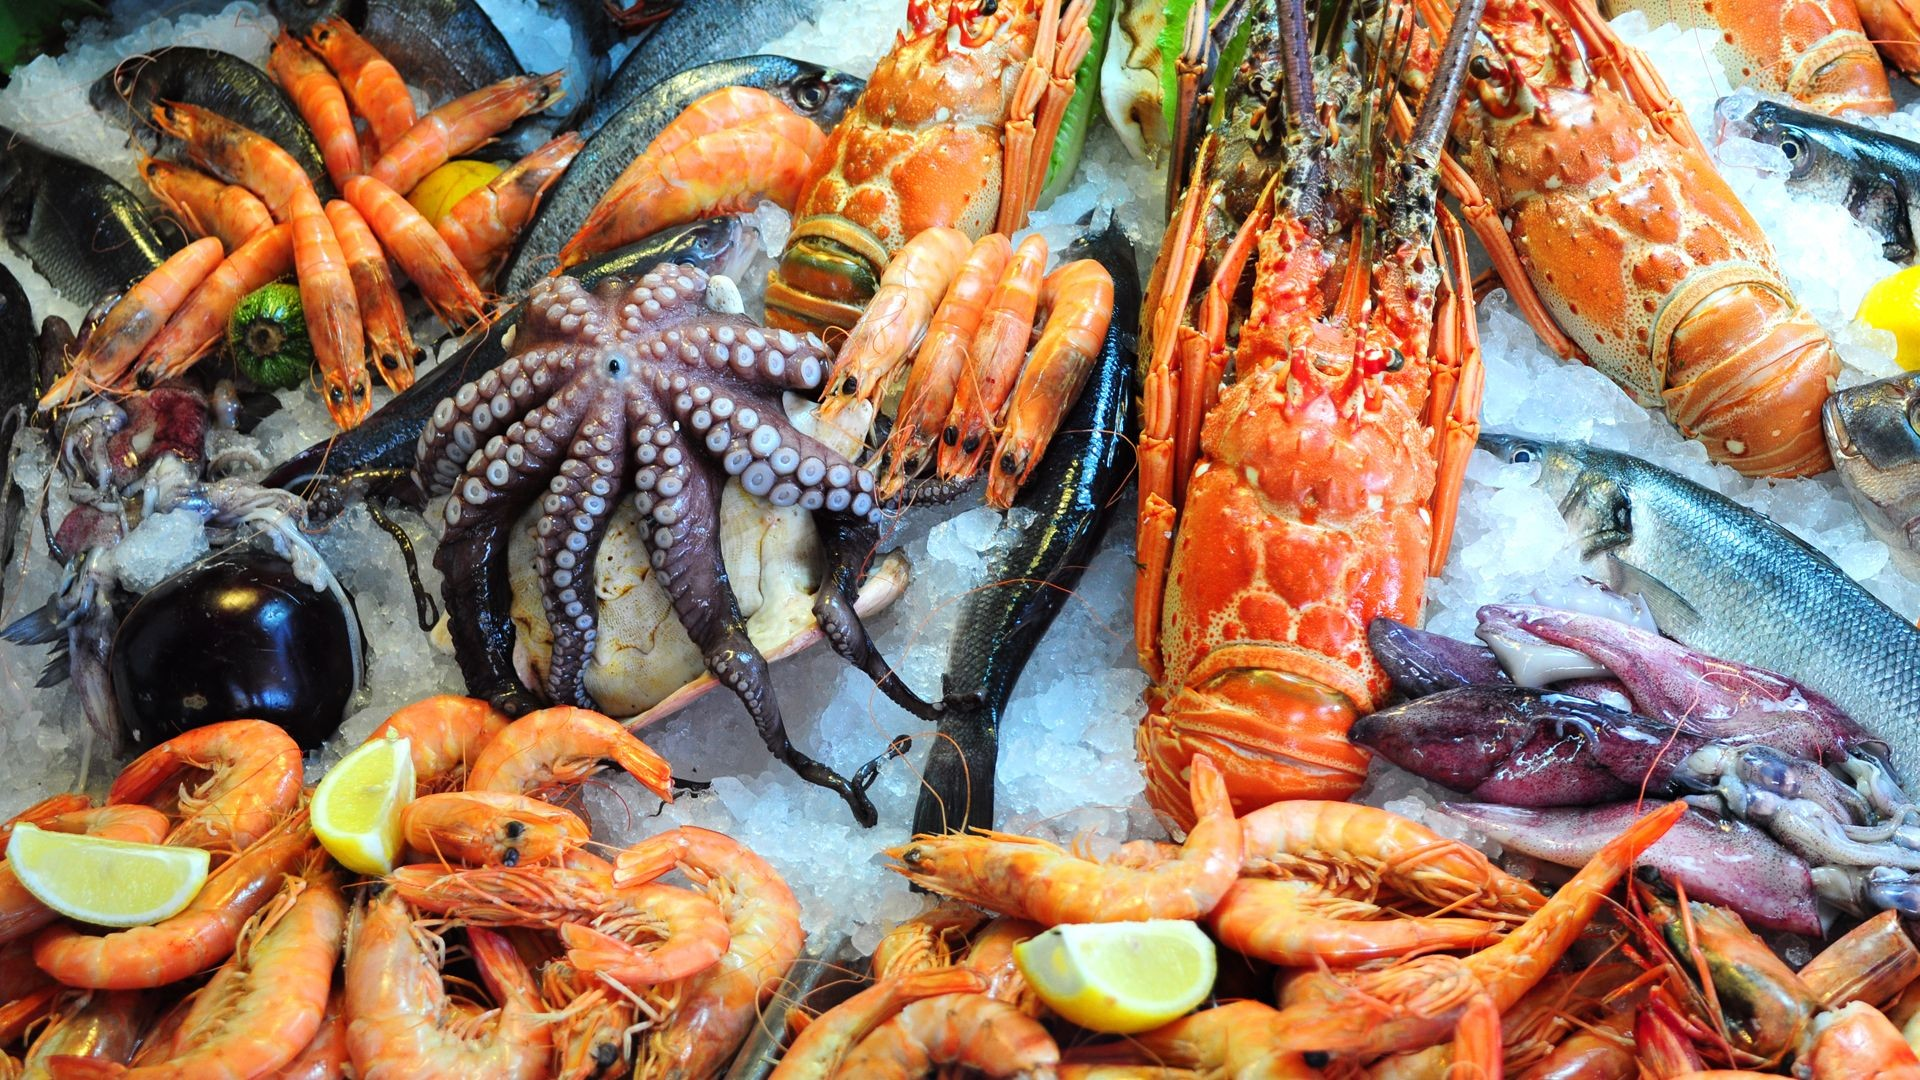 Pescado fresco a domicilio en Atocha madrid